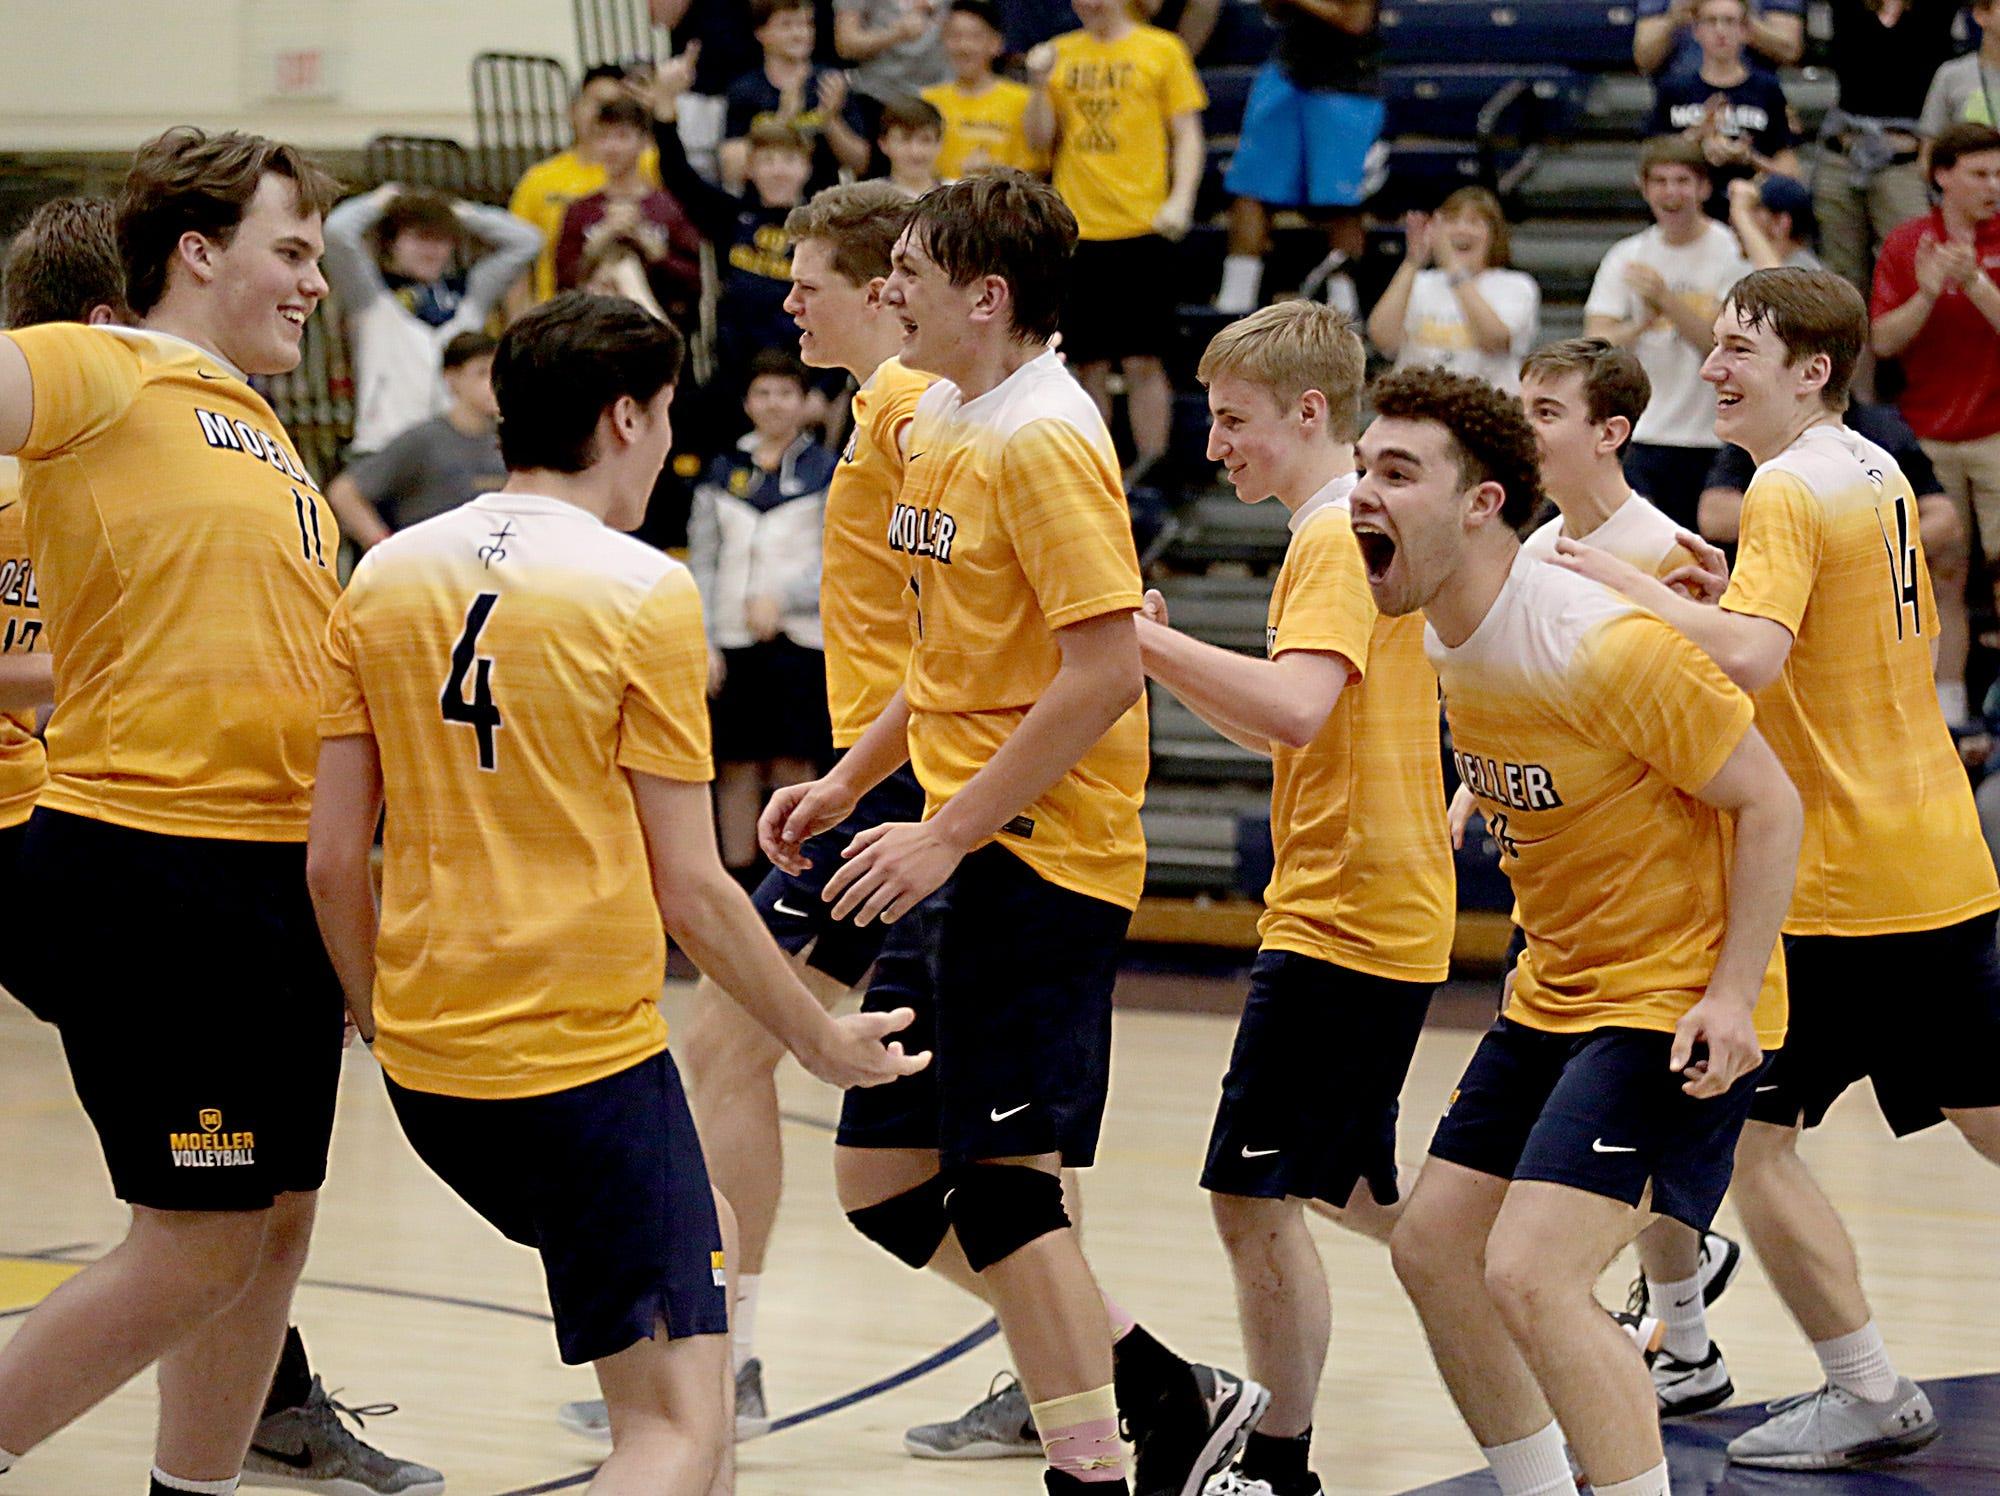 PHOTOS: St. Xavier, Moeller, La Salle win volleyball regional finals, as did Lakota East